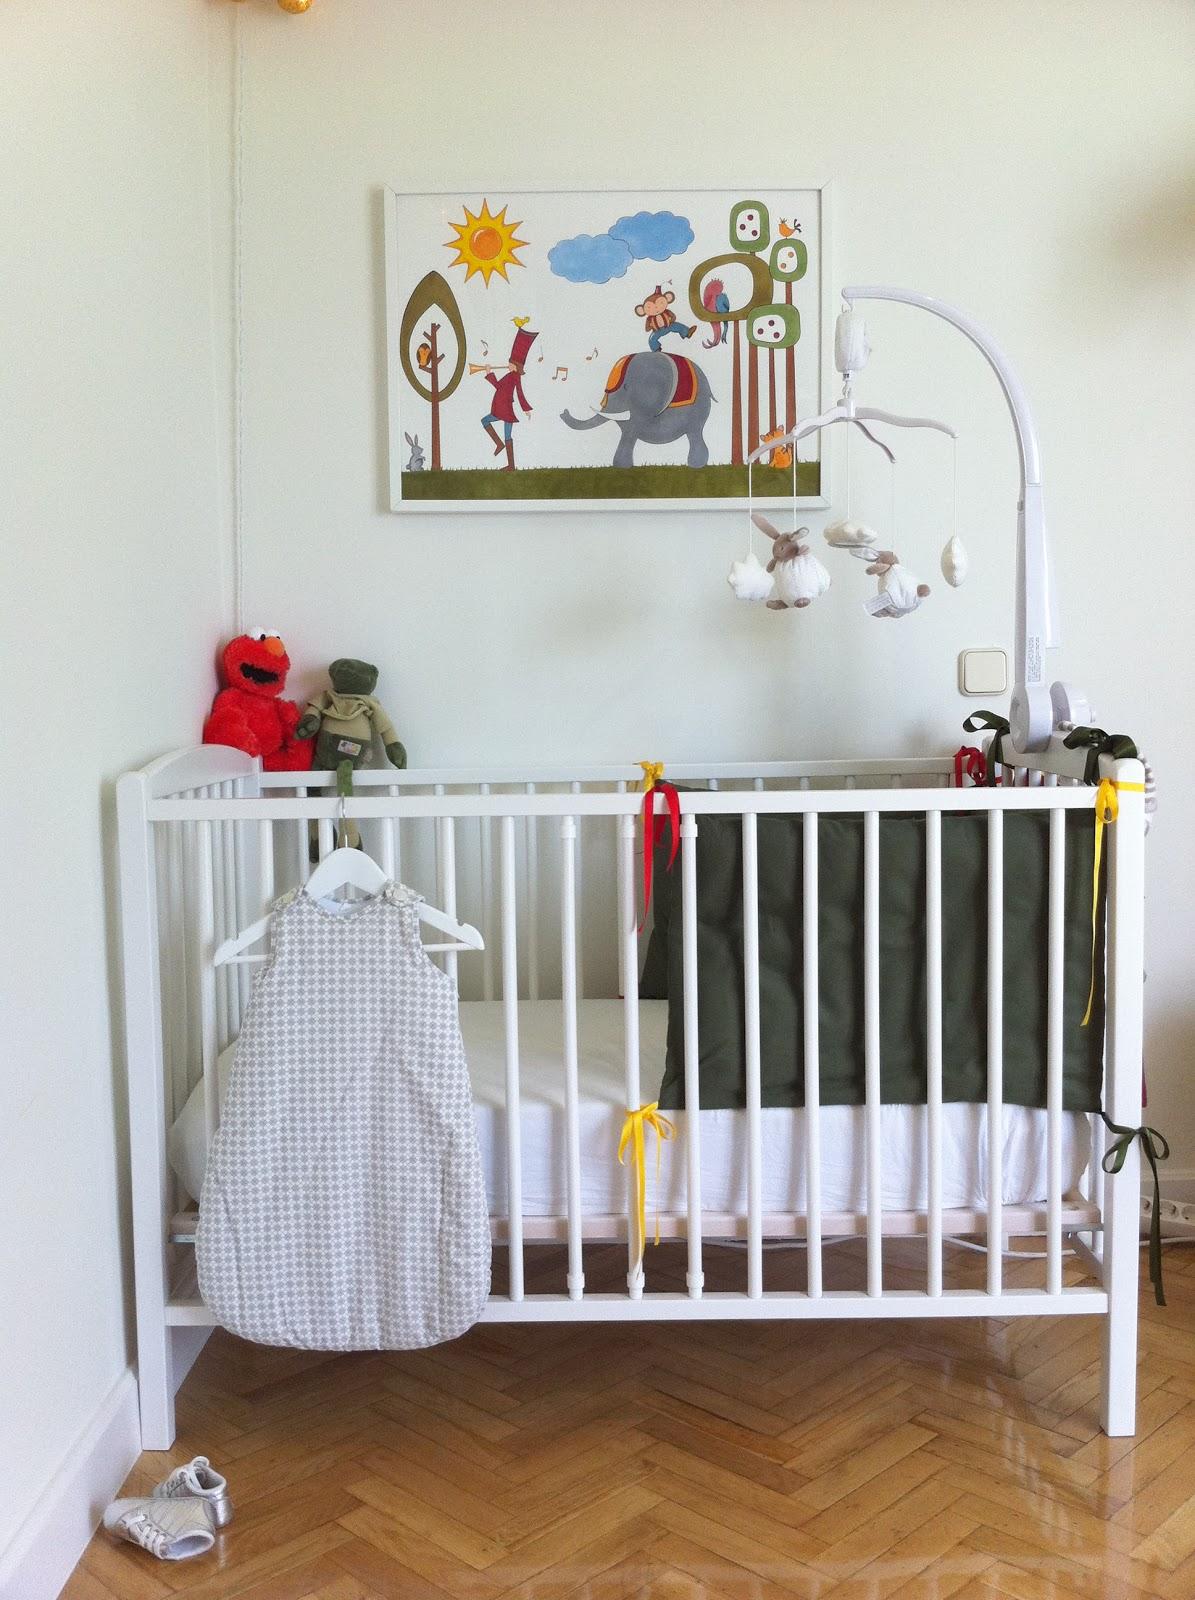 Kidsroomworld hermes en madrid - Zara home kids madrid ...